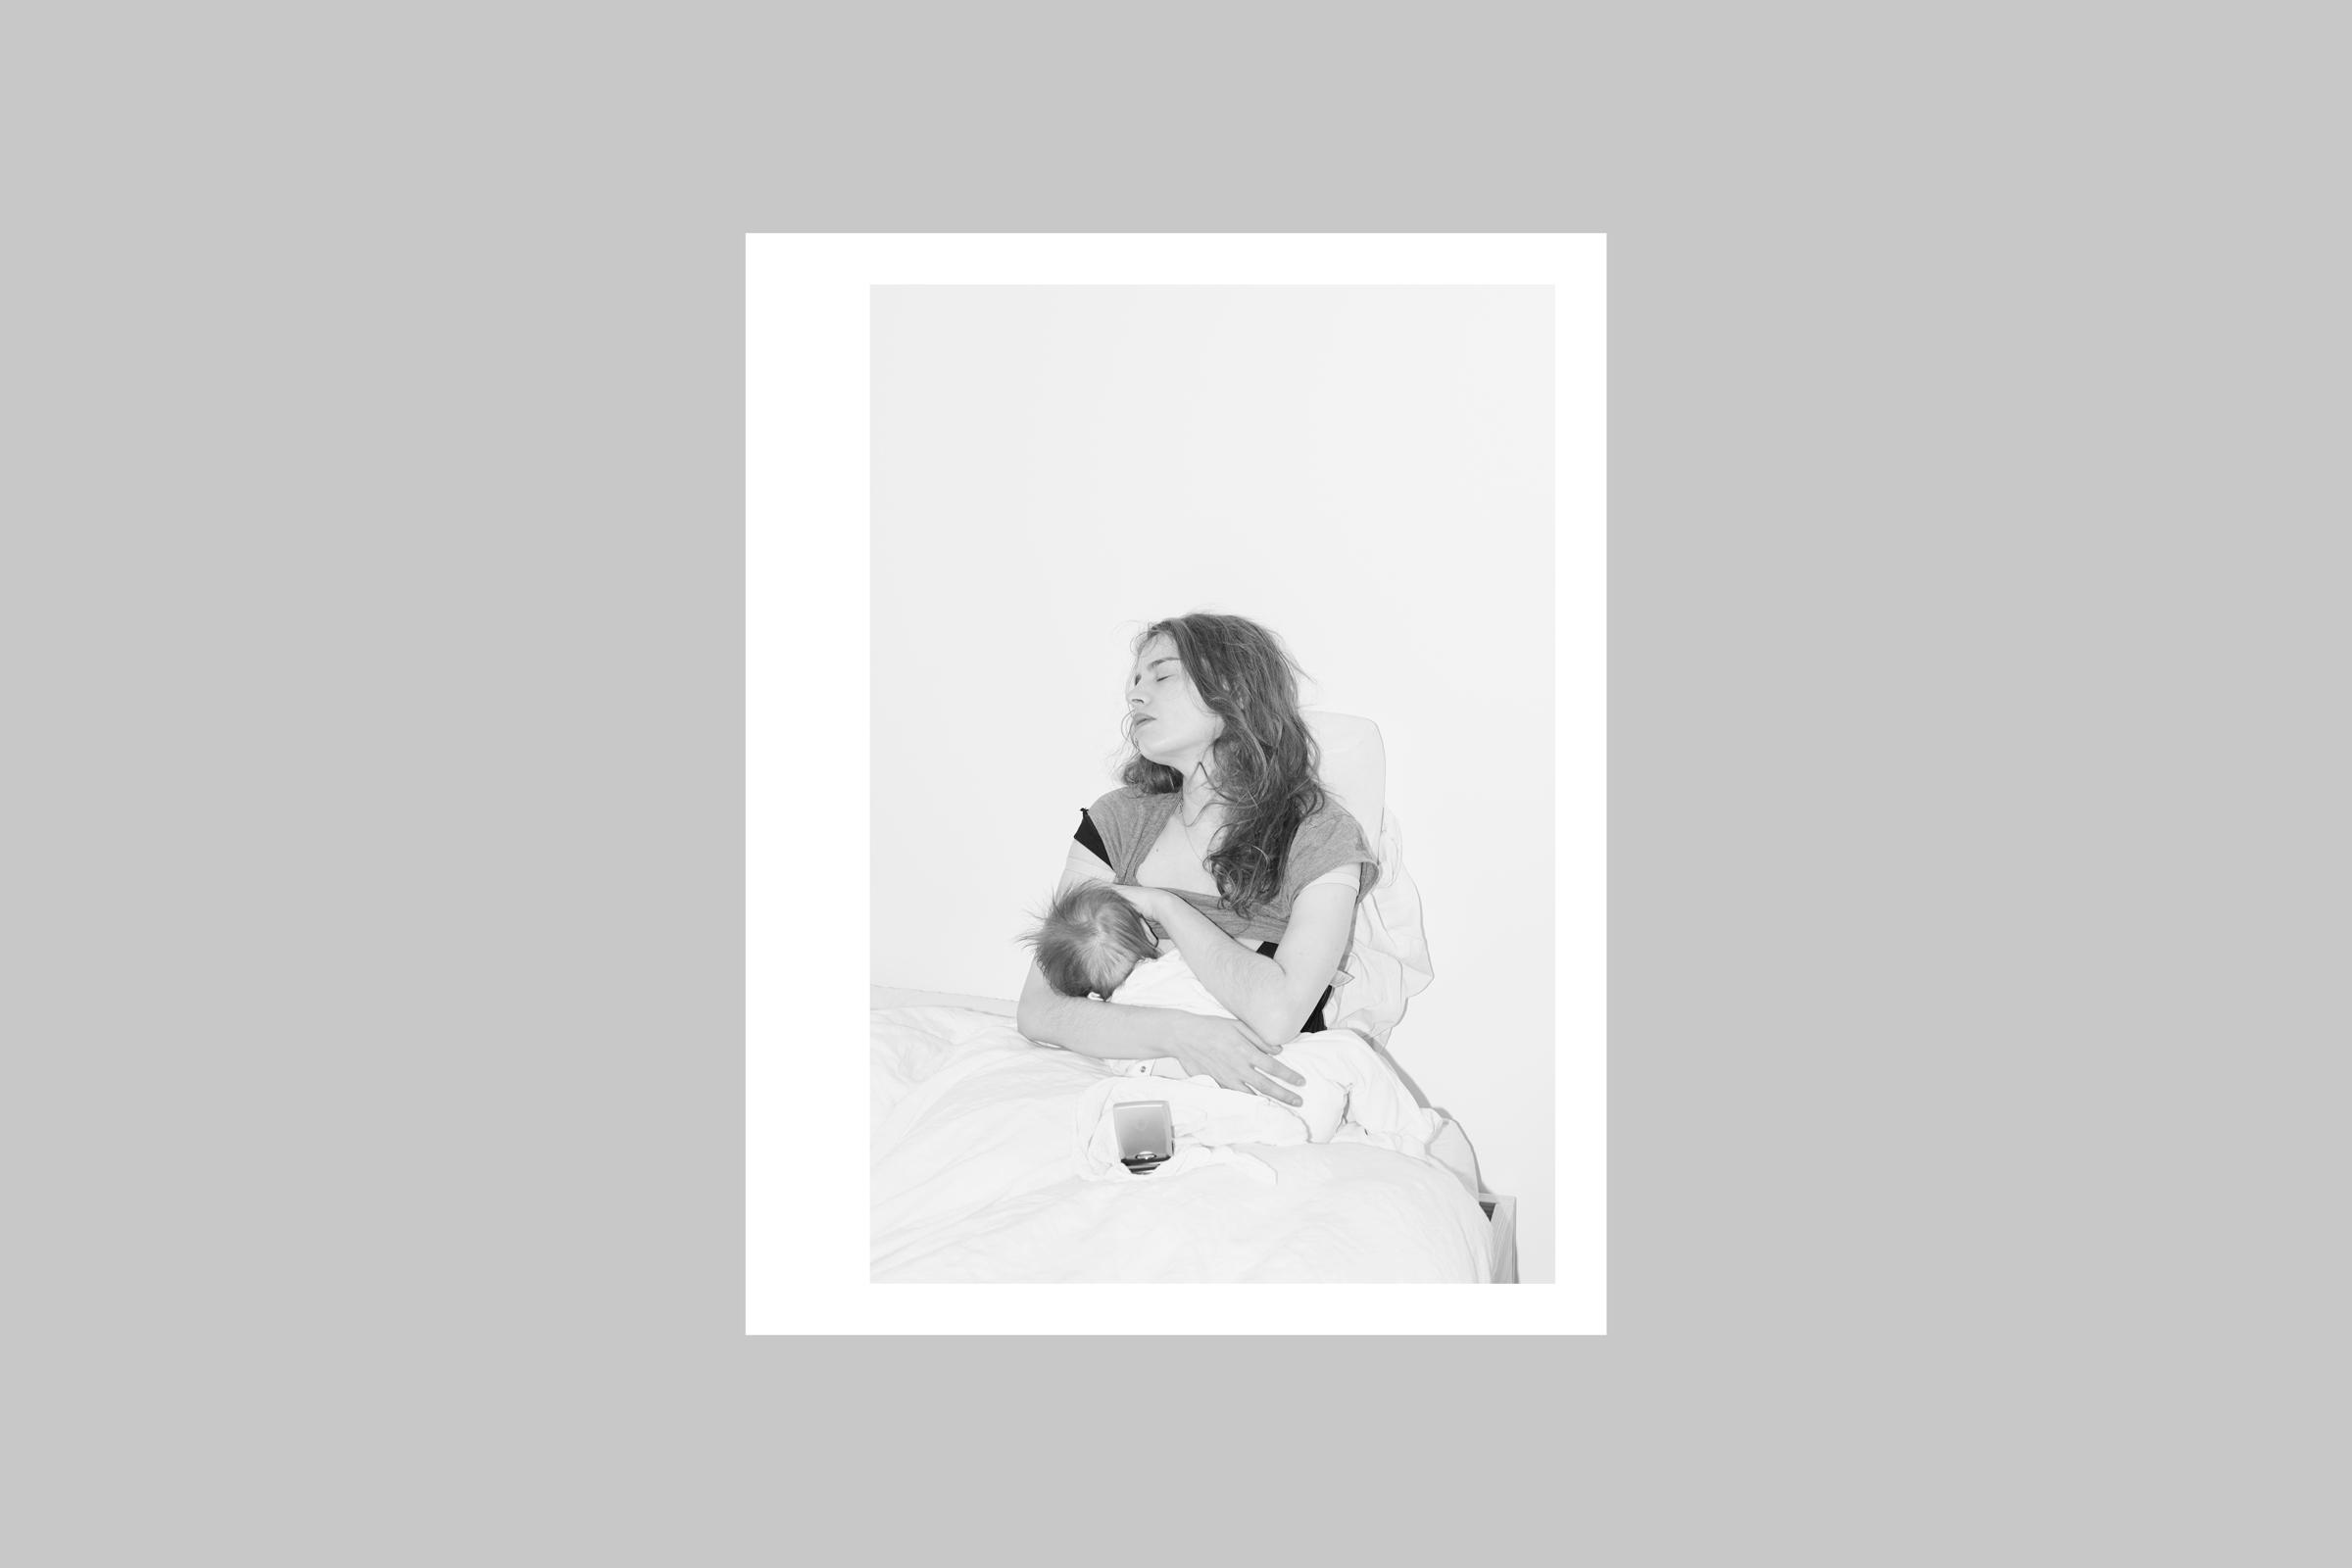 LM-Vincent-Ferrane-Through-the-Night